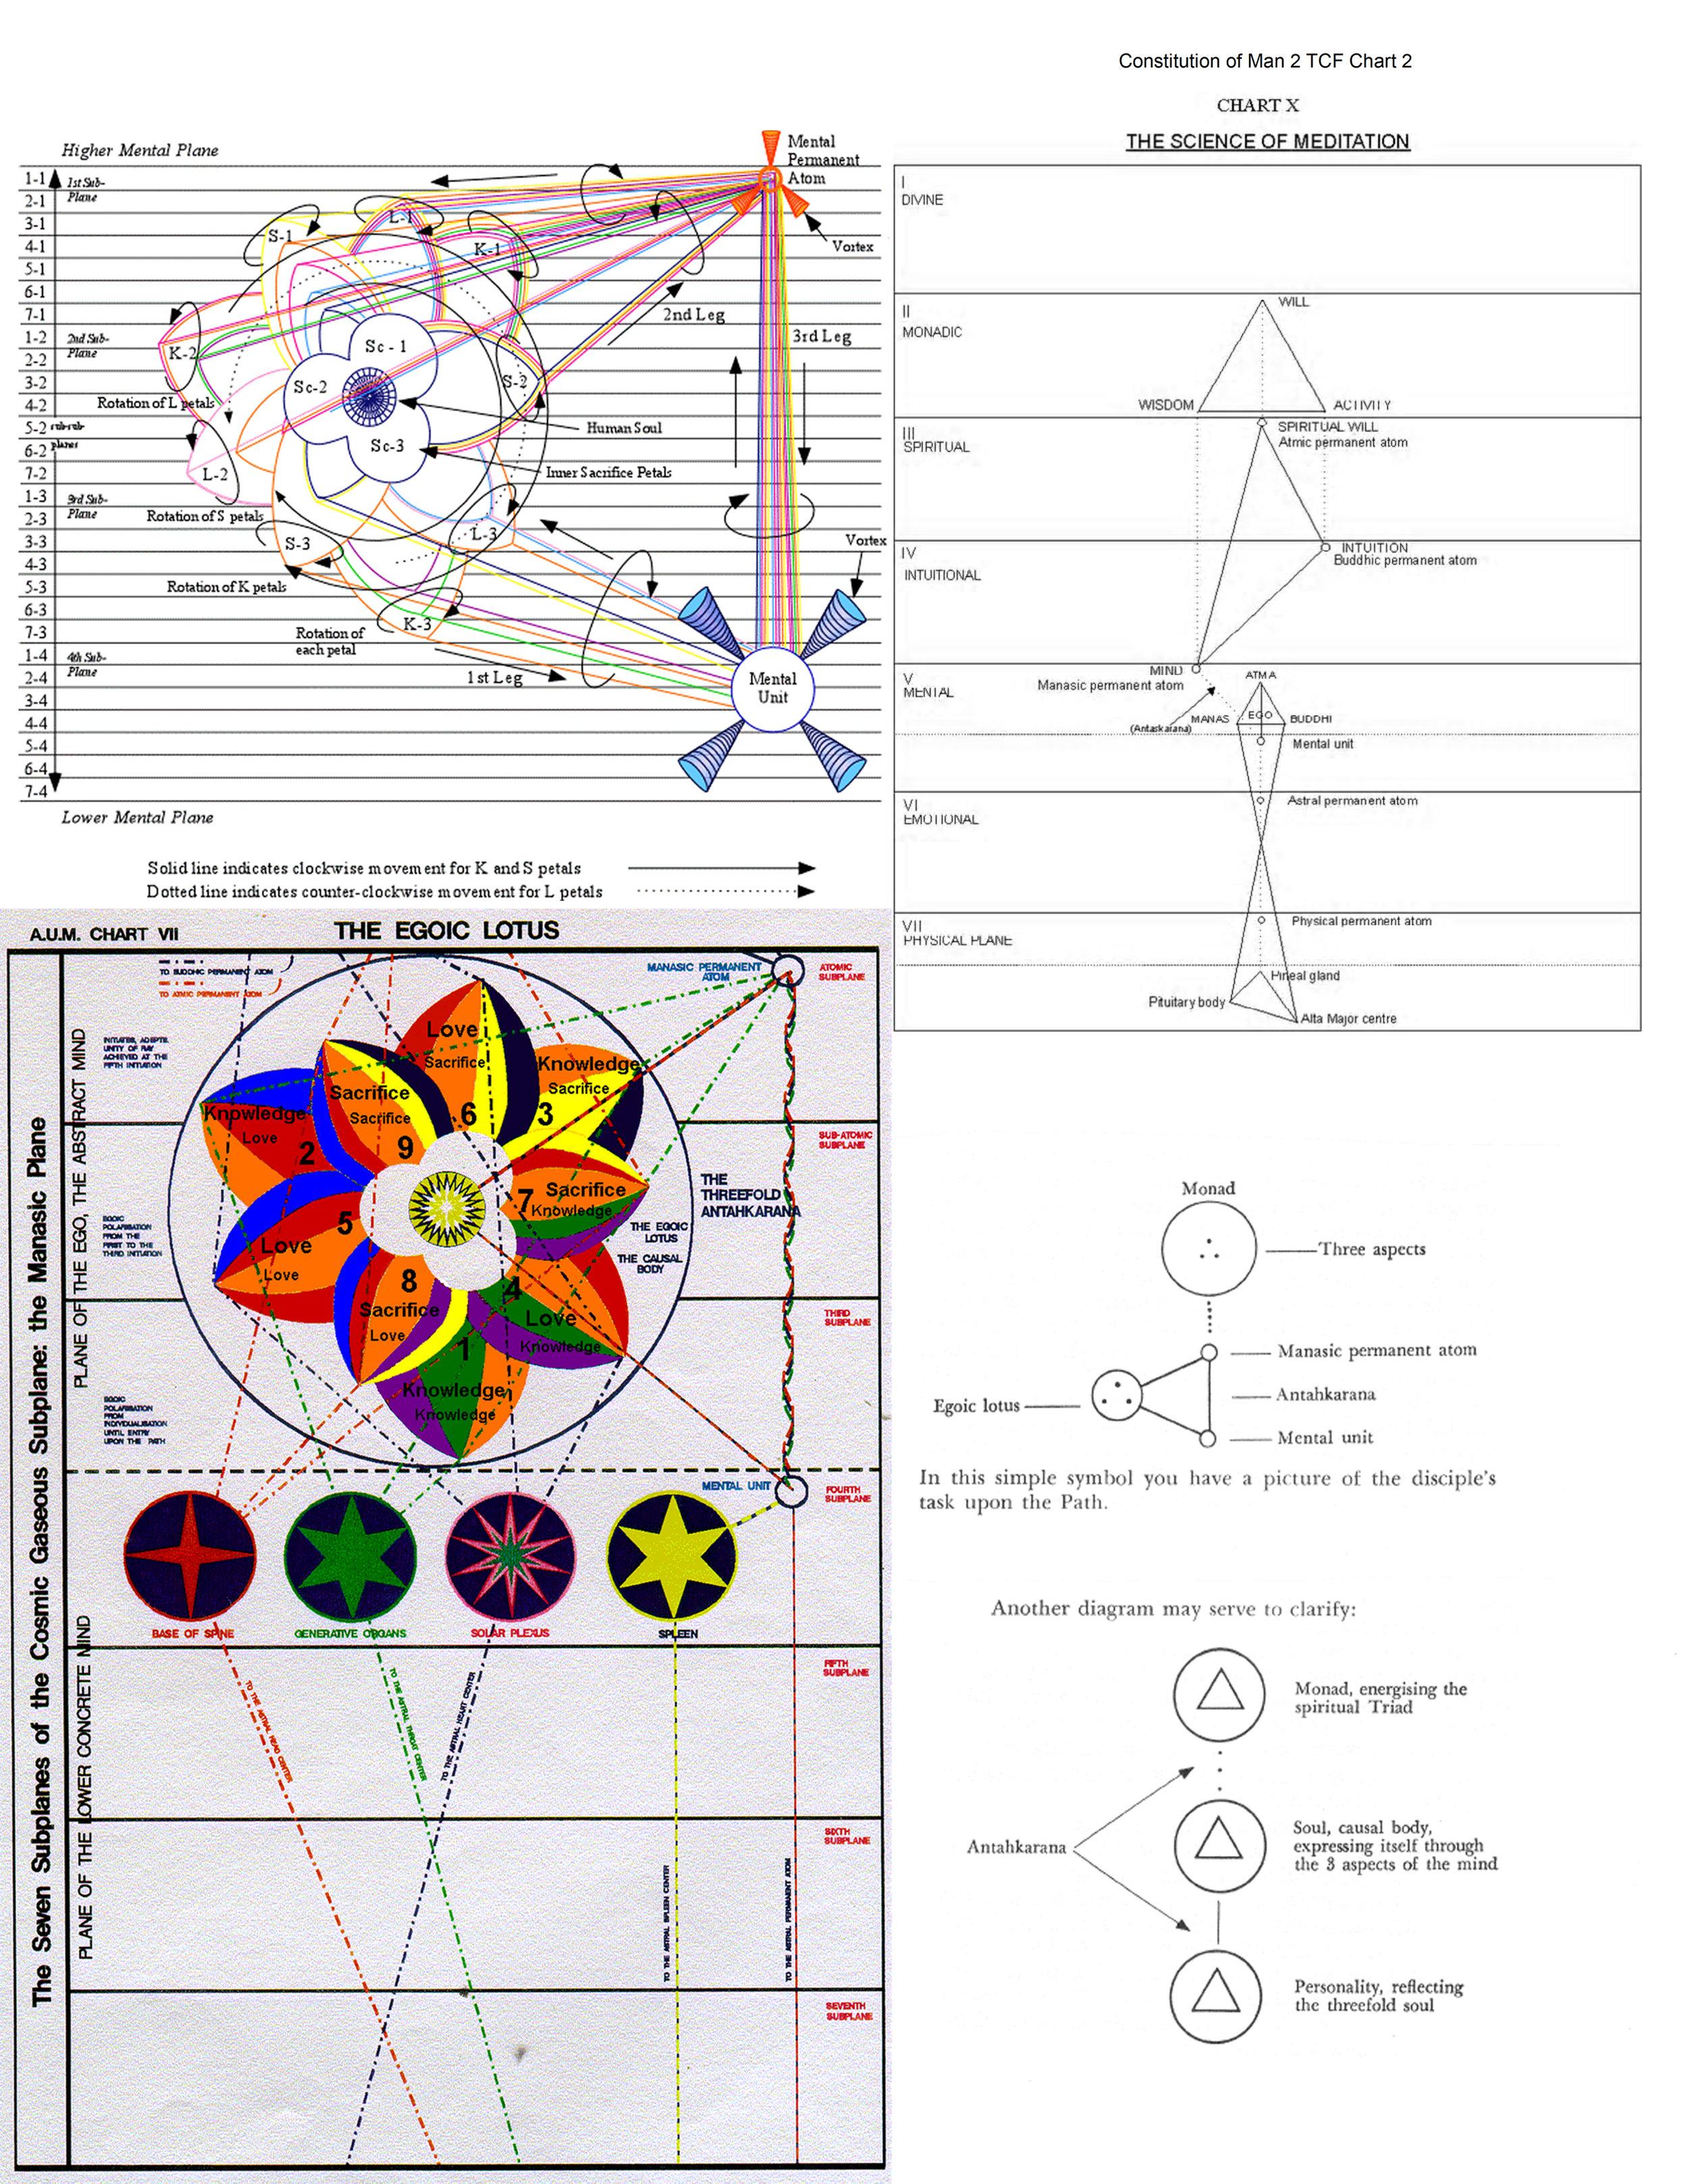 Antahkarana-Charts Compared-Jo Walz.jpg